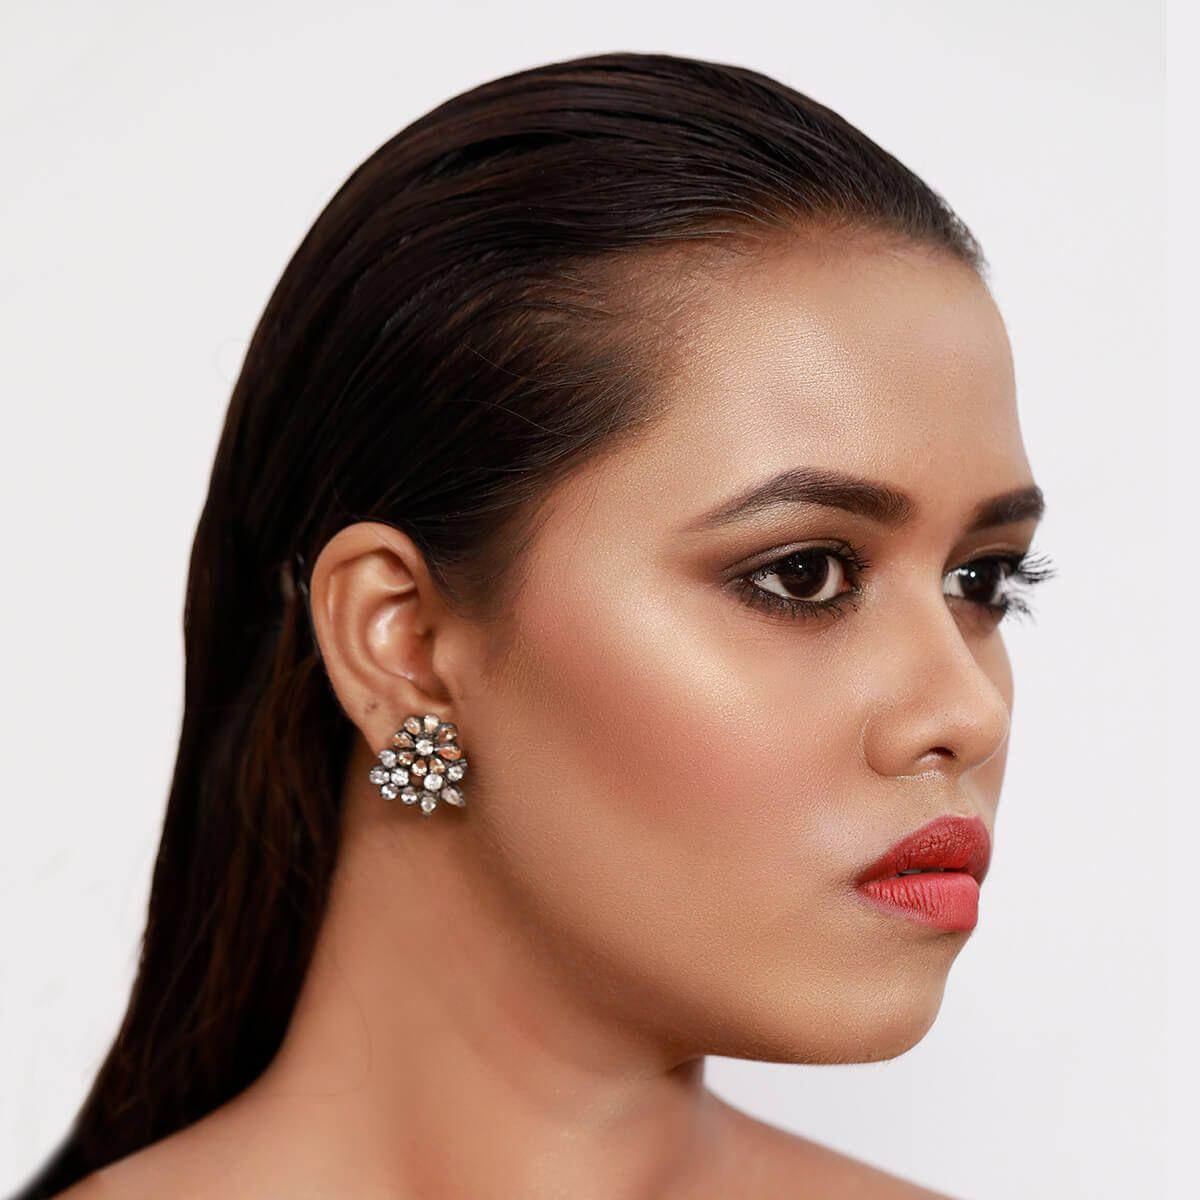 Shining Diva - Red Carpet Makeup Look